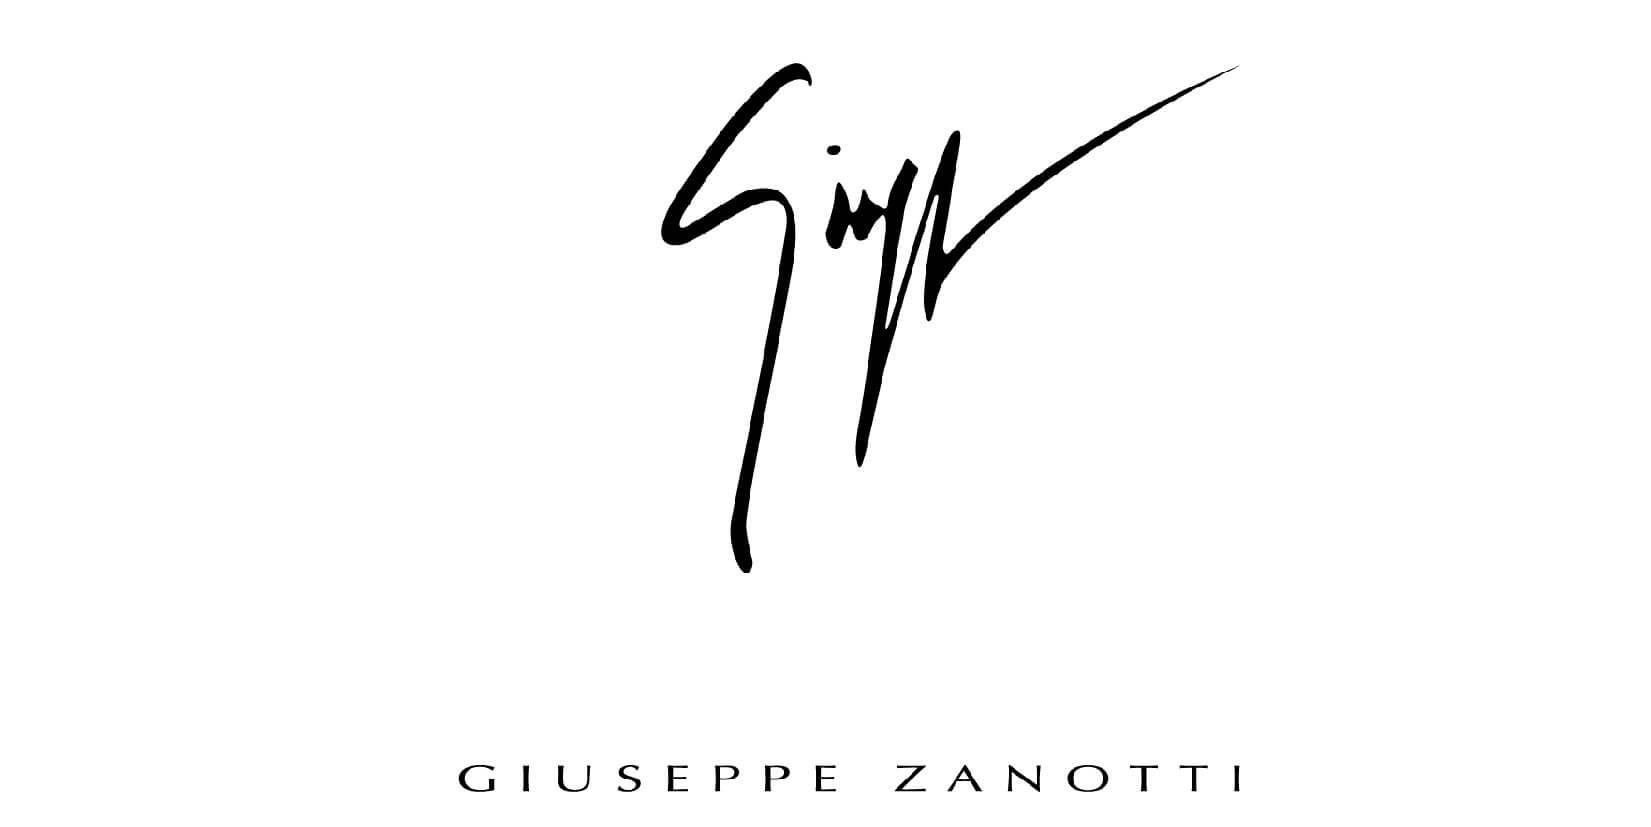 Giuseppe Zanotti macau jobscall.me recruitment ad 澳門招聘-01.jpg